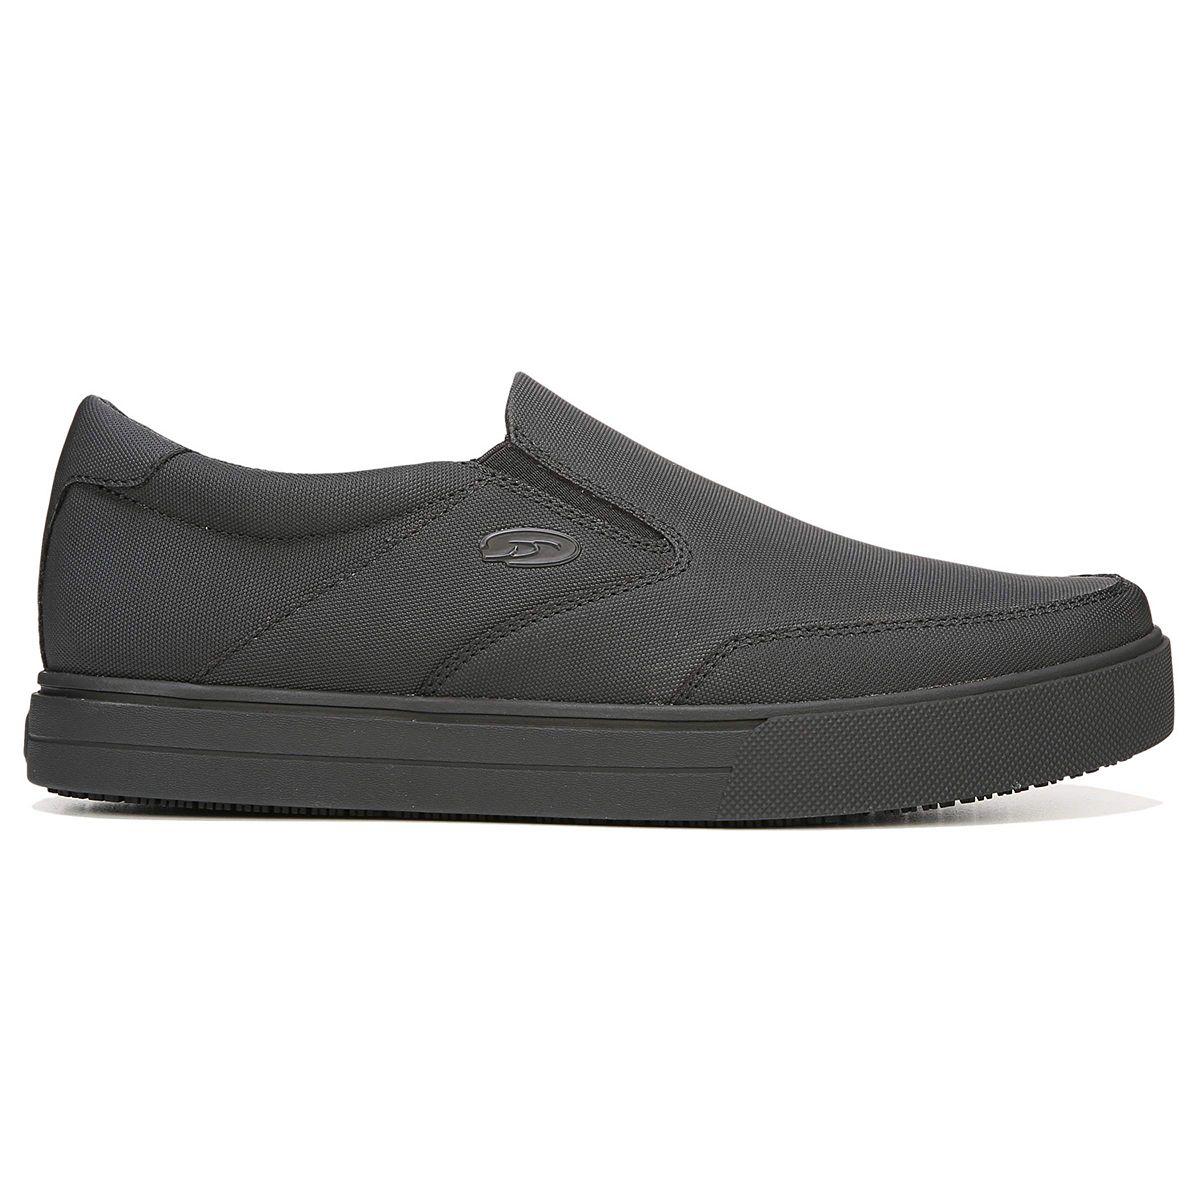 Dr. Scholl's Valiant Men's Slip-On Sneakers 9Y0PH